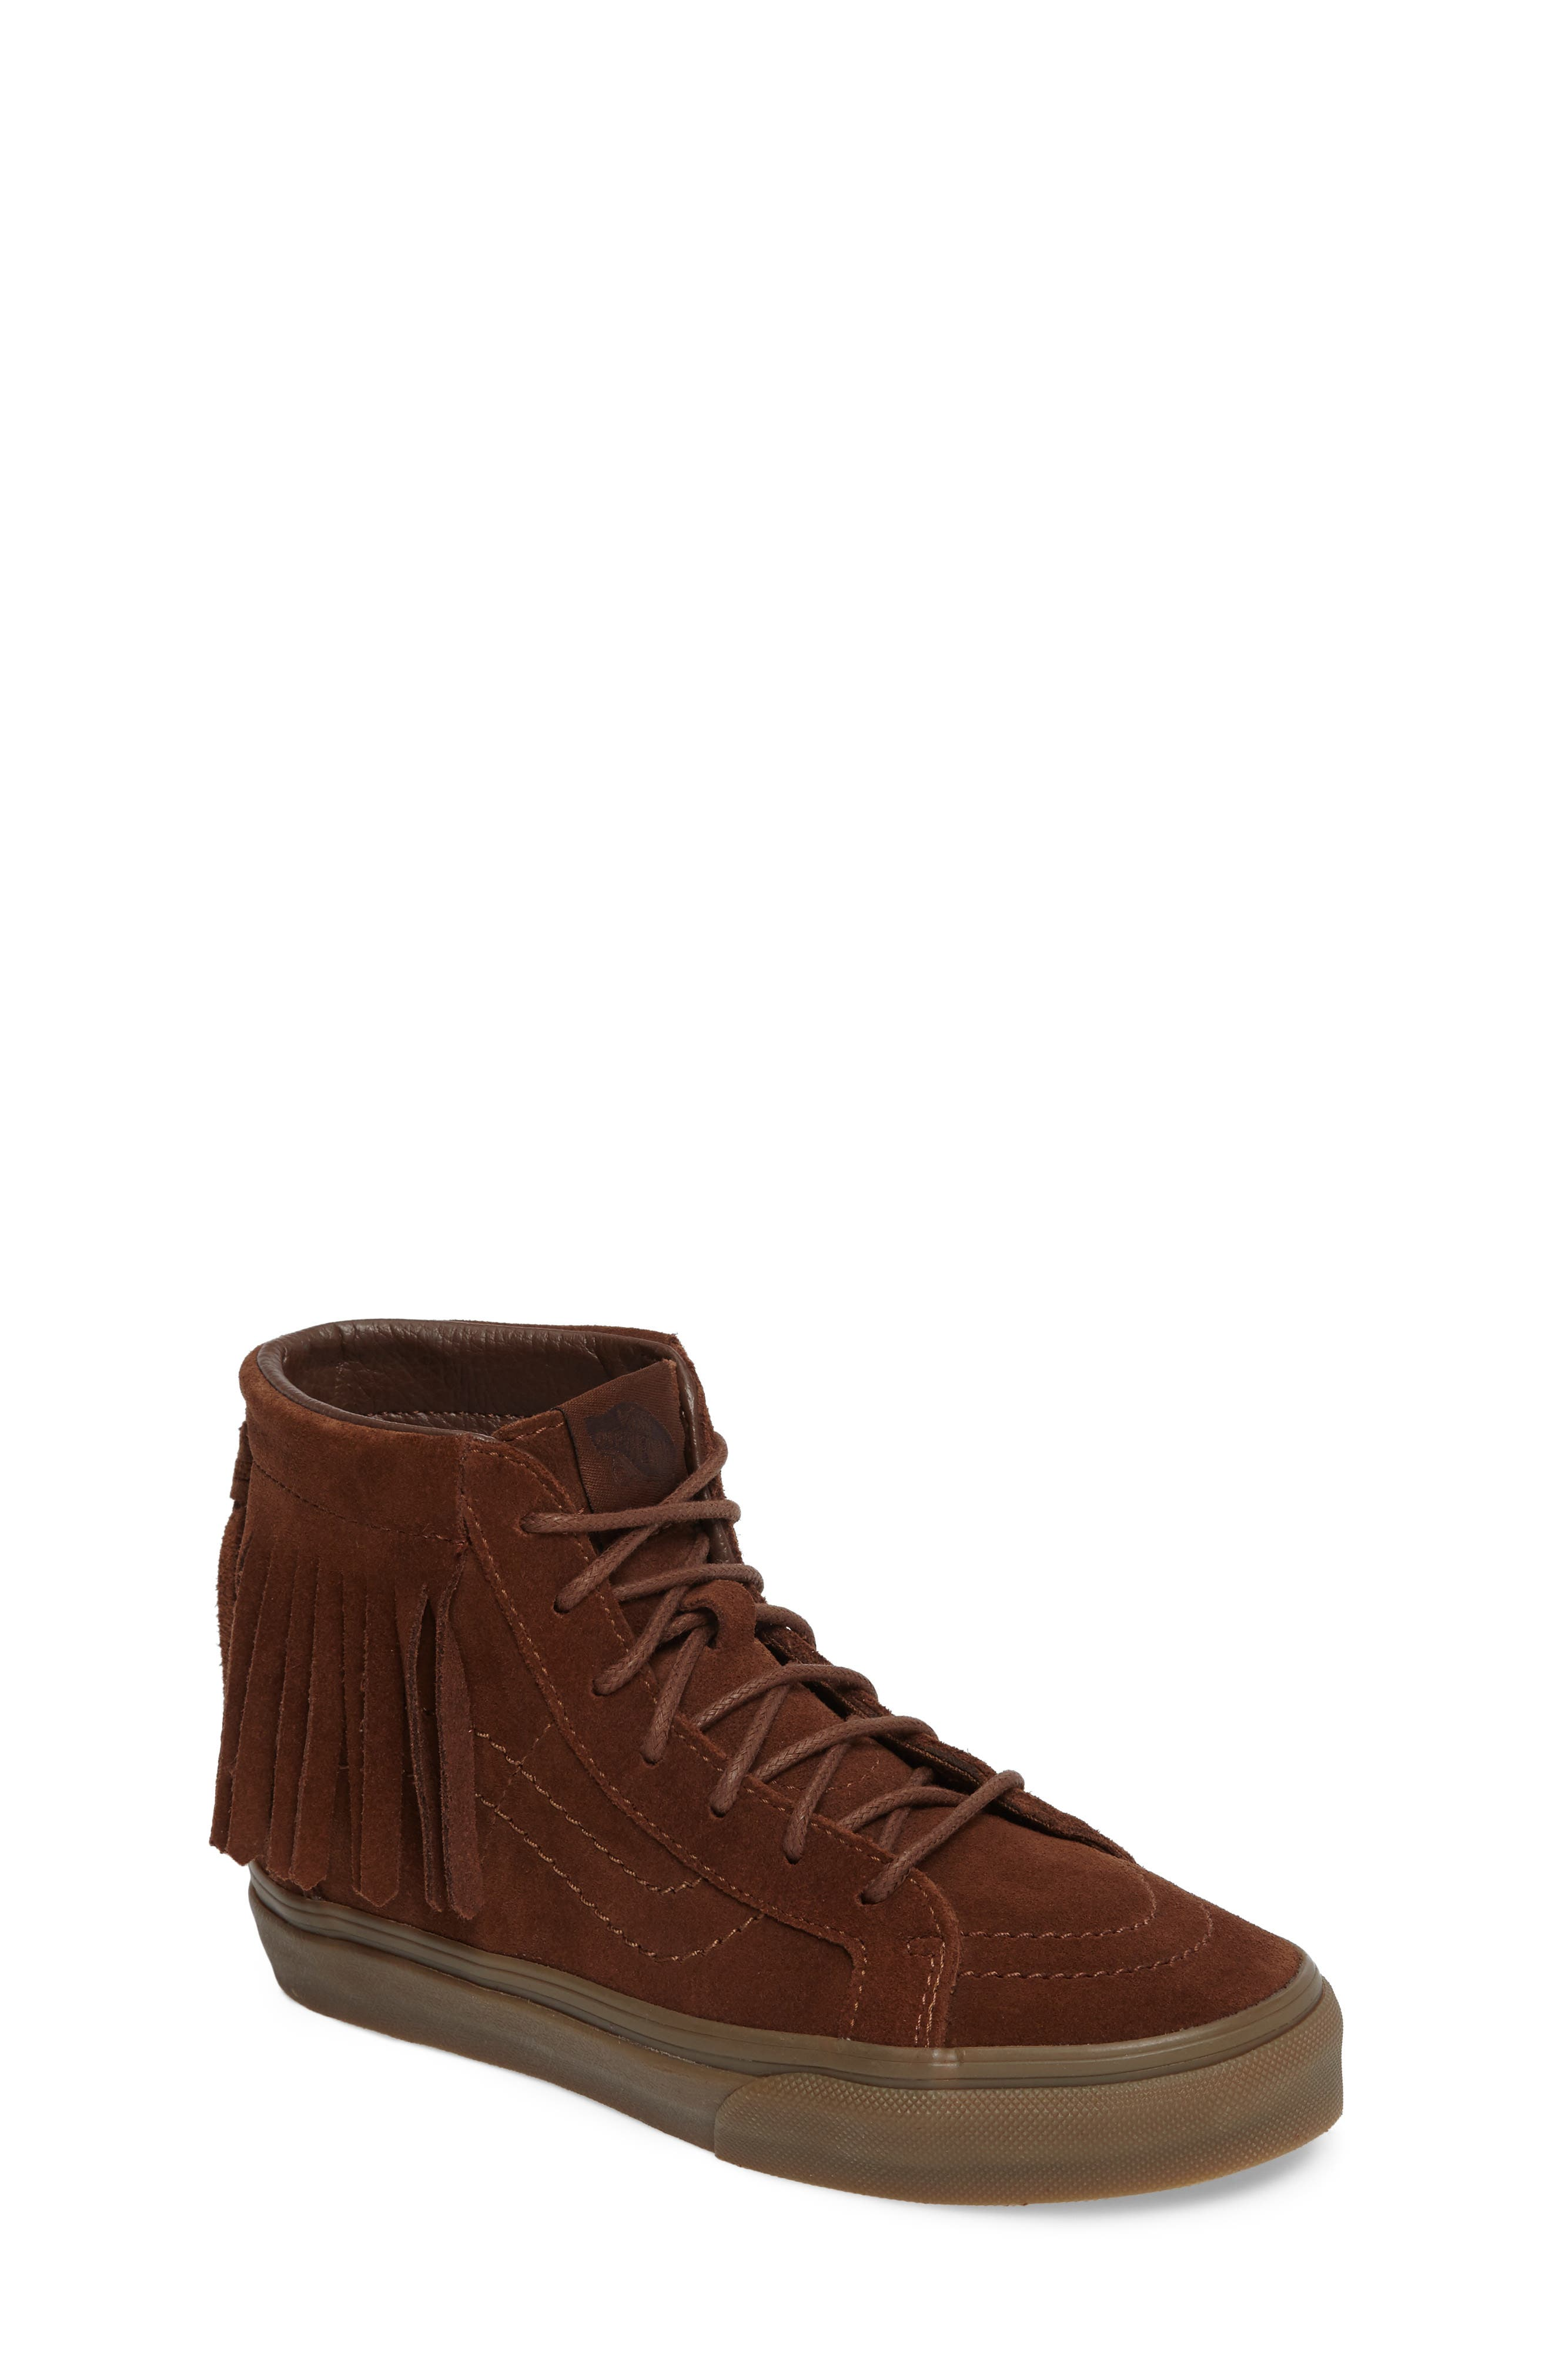 SK8-Hi Moc Sneaker,                             Main thumbnail 1, color,                             200